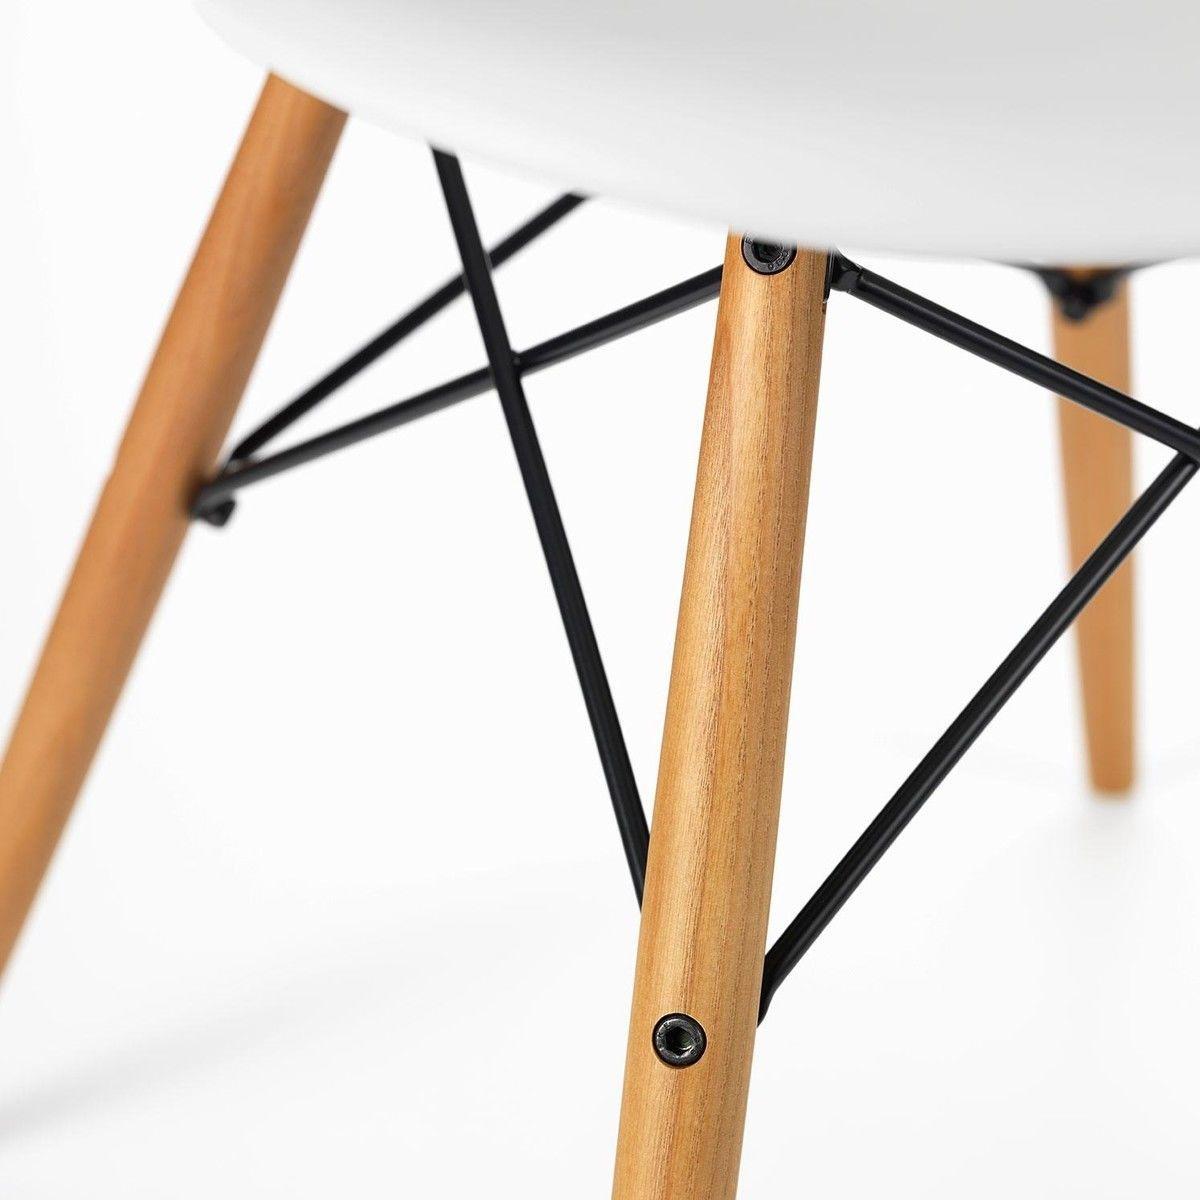 Eames plastic chair vitra - Vitra Eames Plastic Armchair Daw Ash